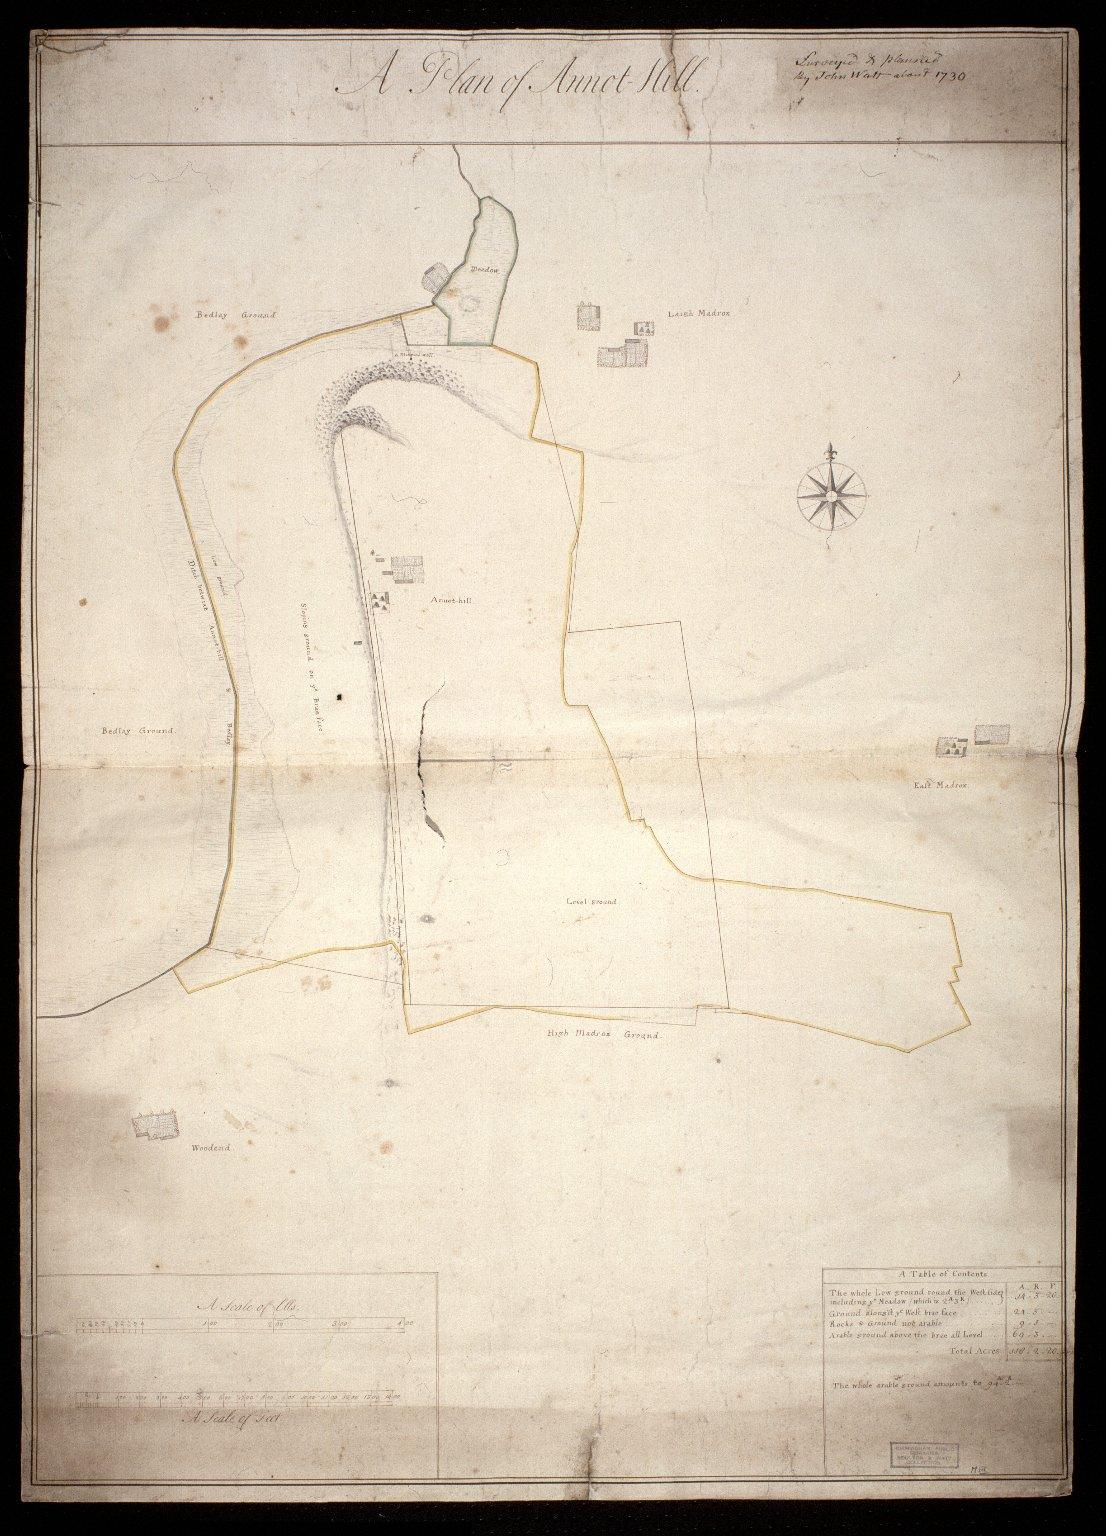 [Plan of Arnot-hill, Lanarkshire, by John Watt] [1 of 1]